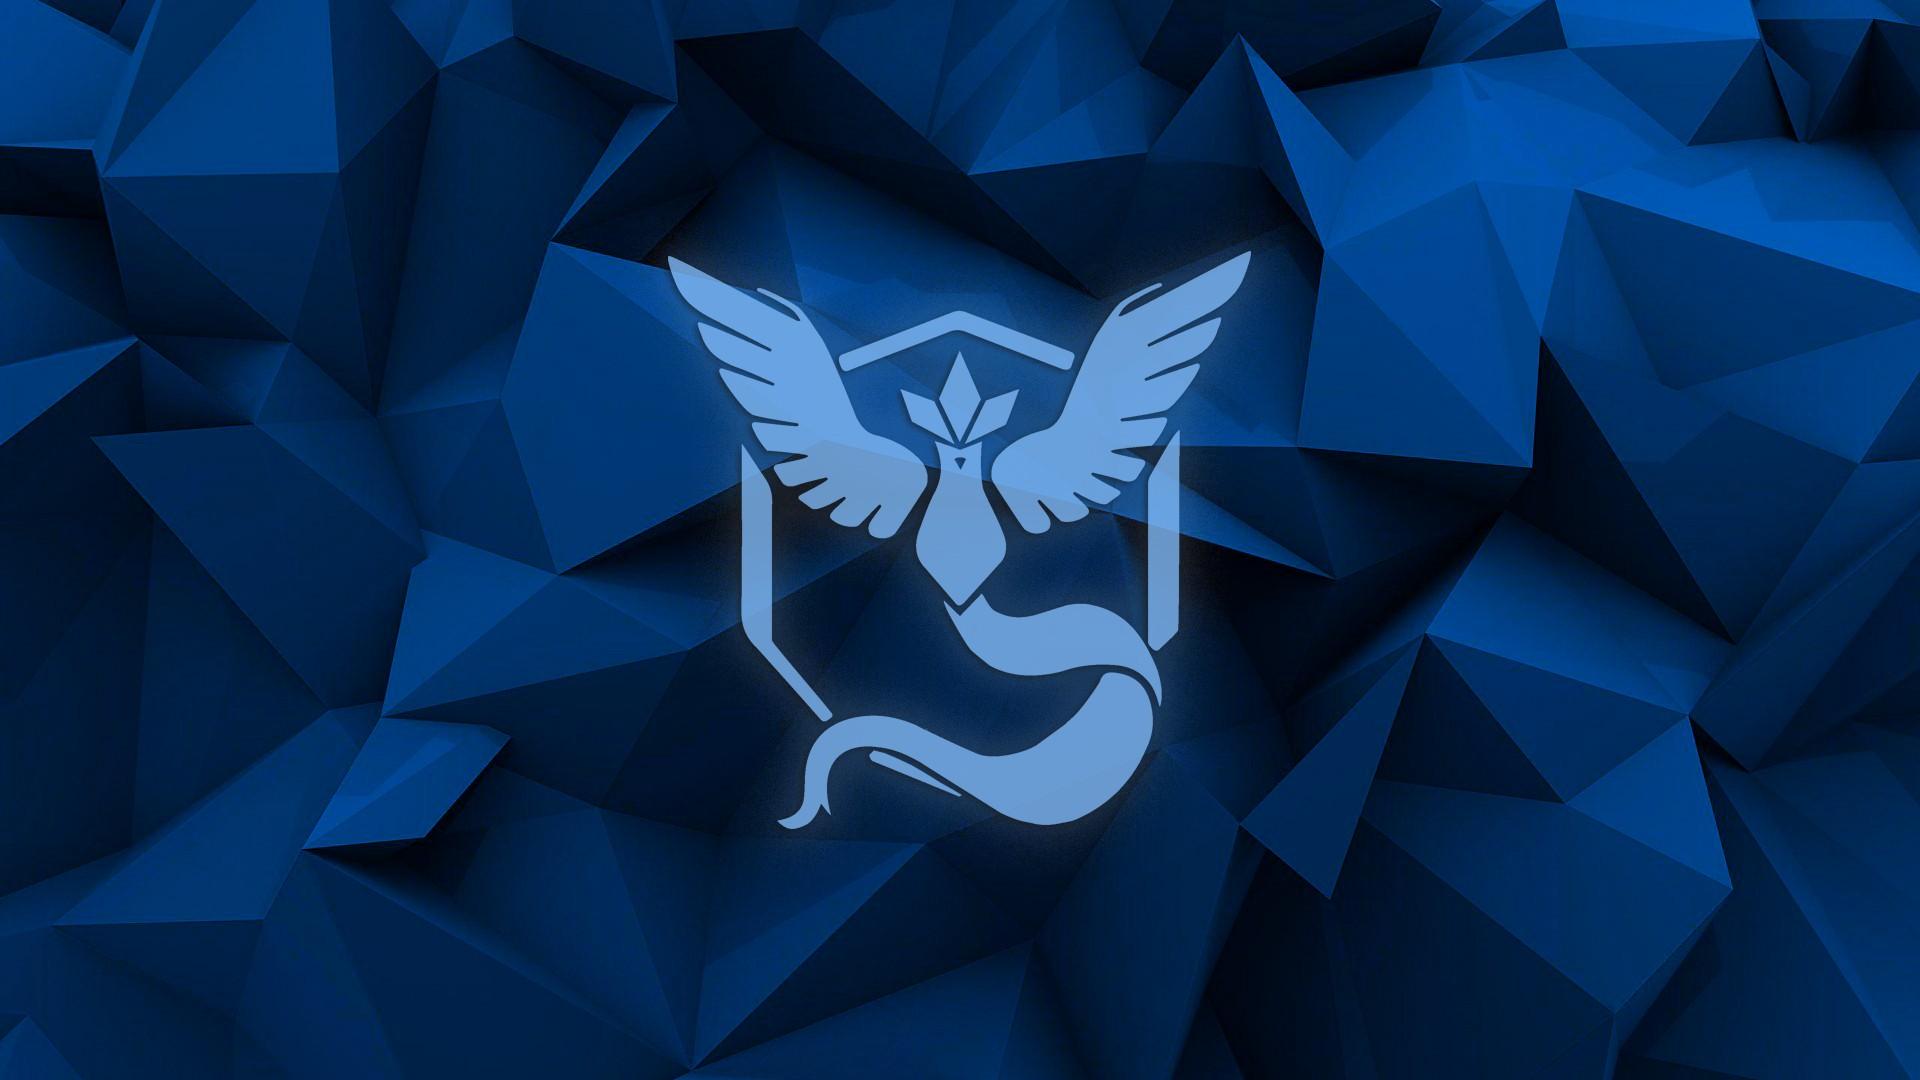 Wallpaper 1920x1080 Px Blue Pokemon Poly Team Mystic